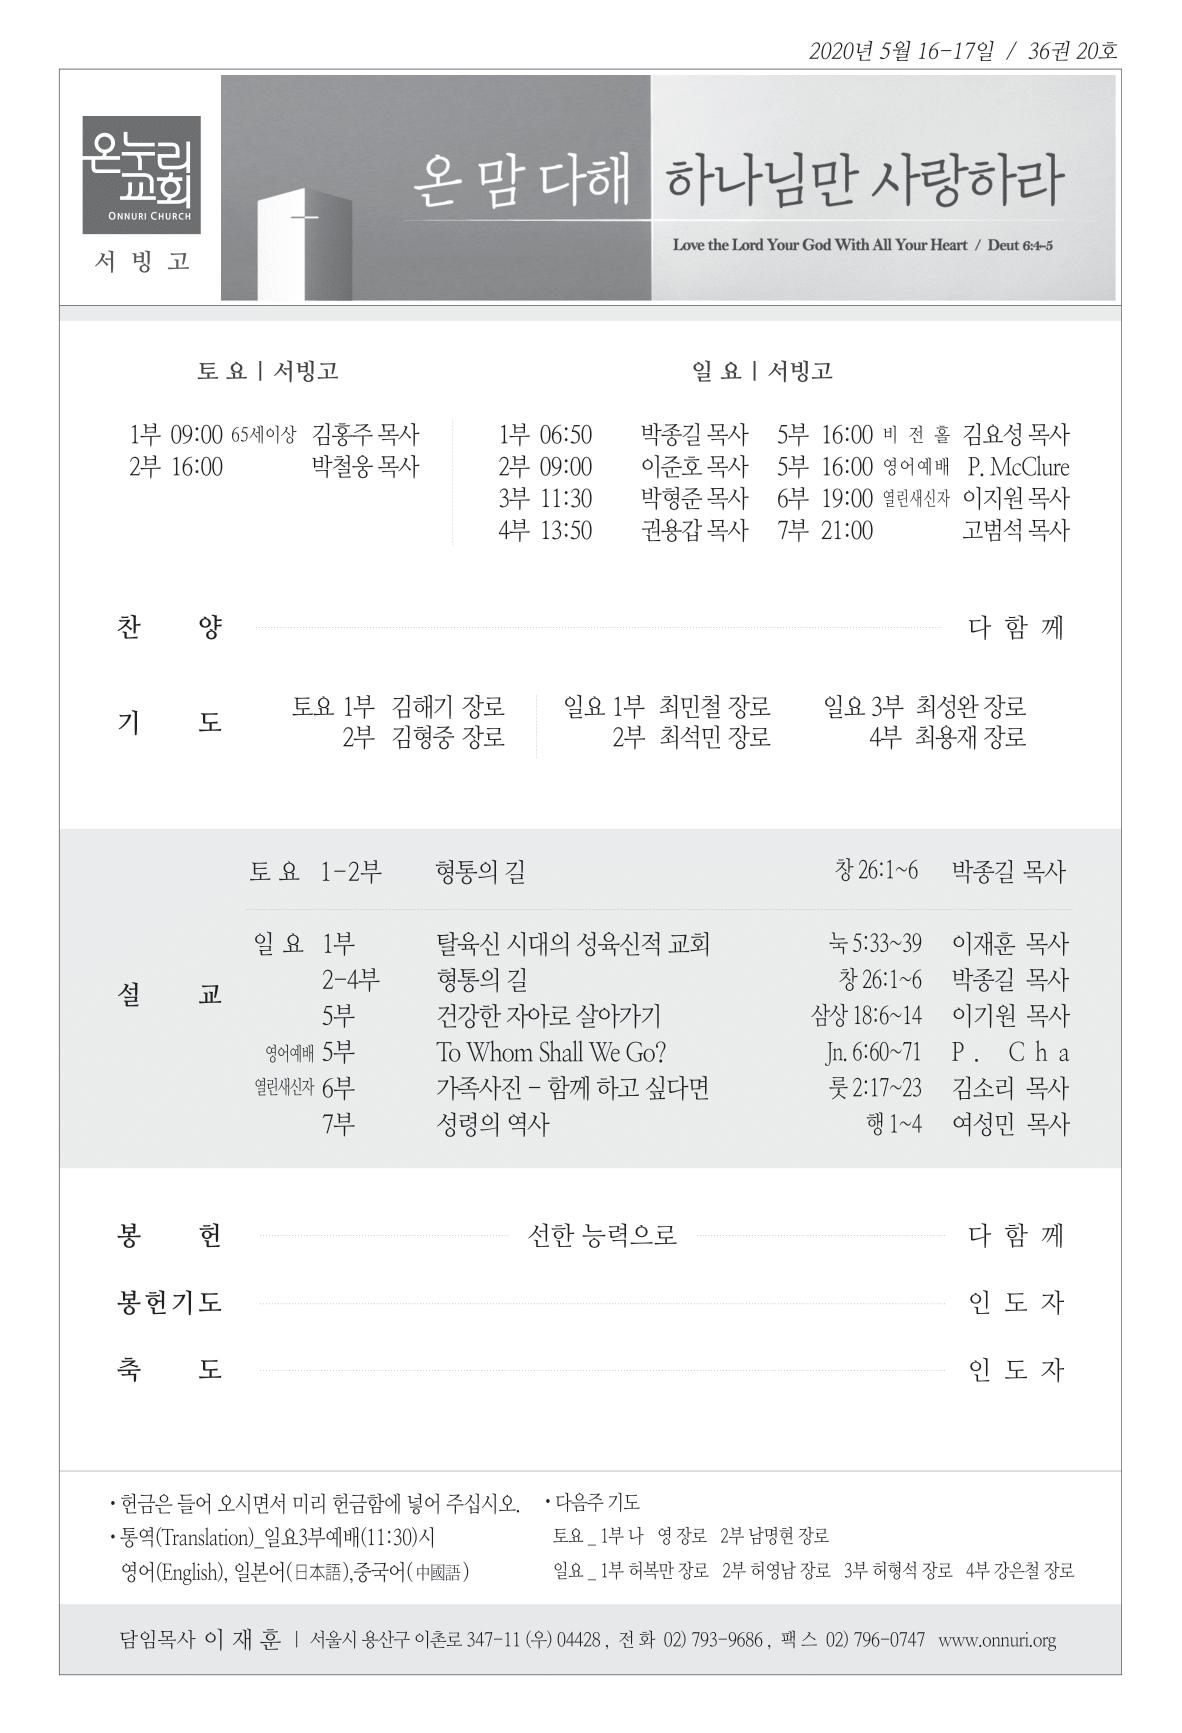 seobingo_200516